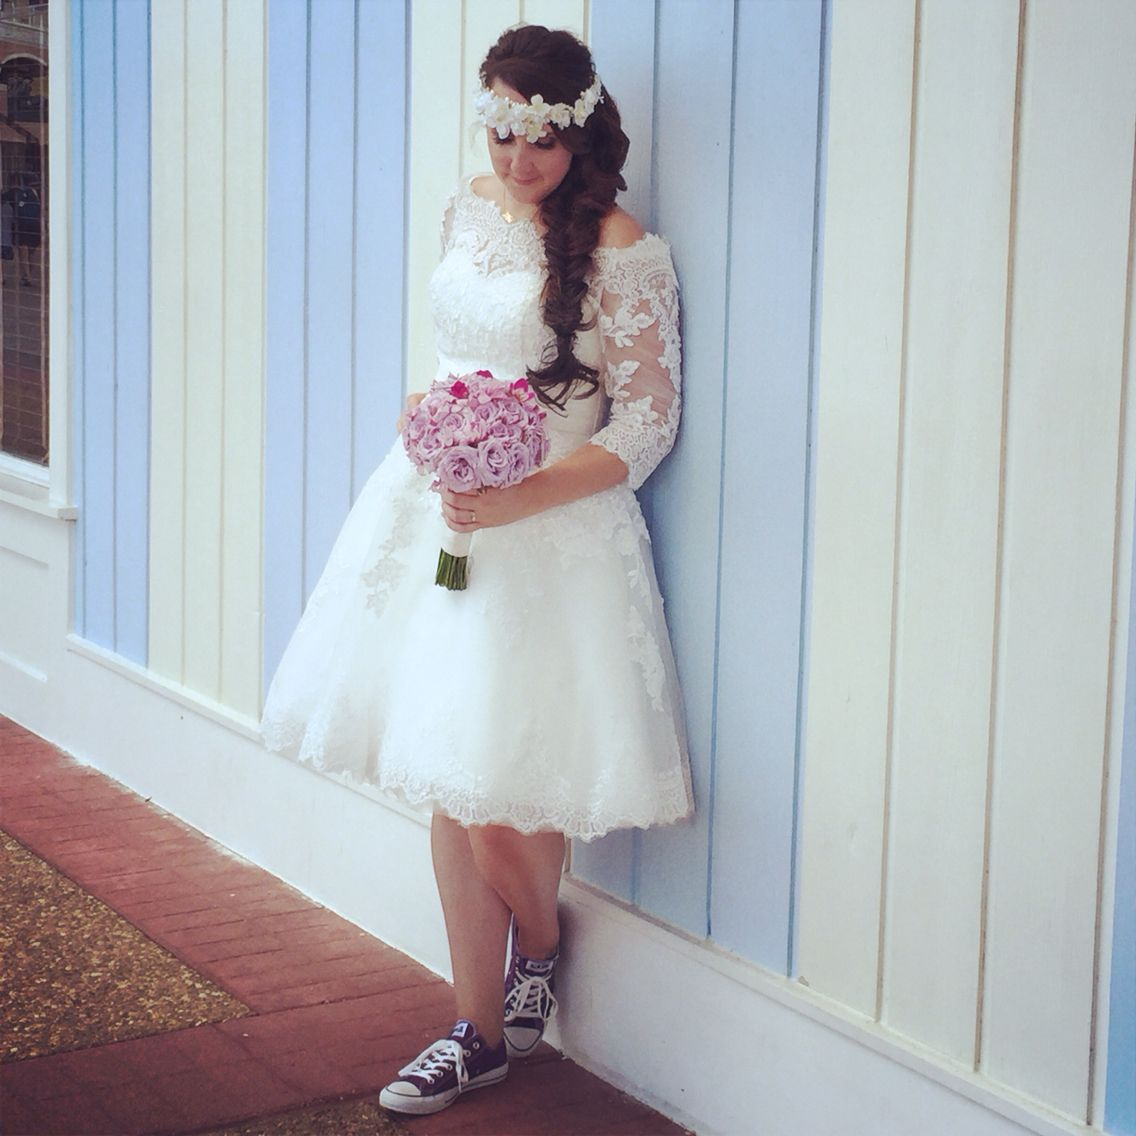 Bride Short Wedding Dress With Converse WeddOn